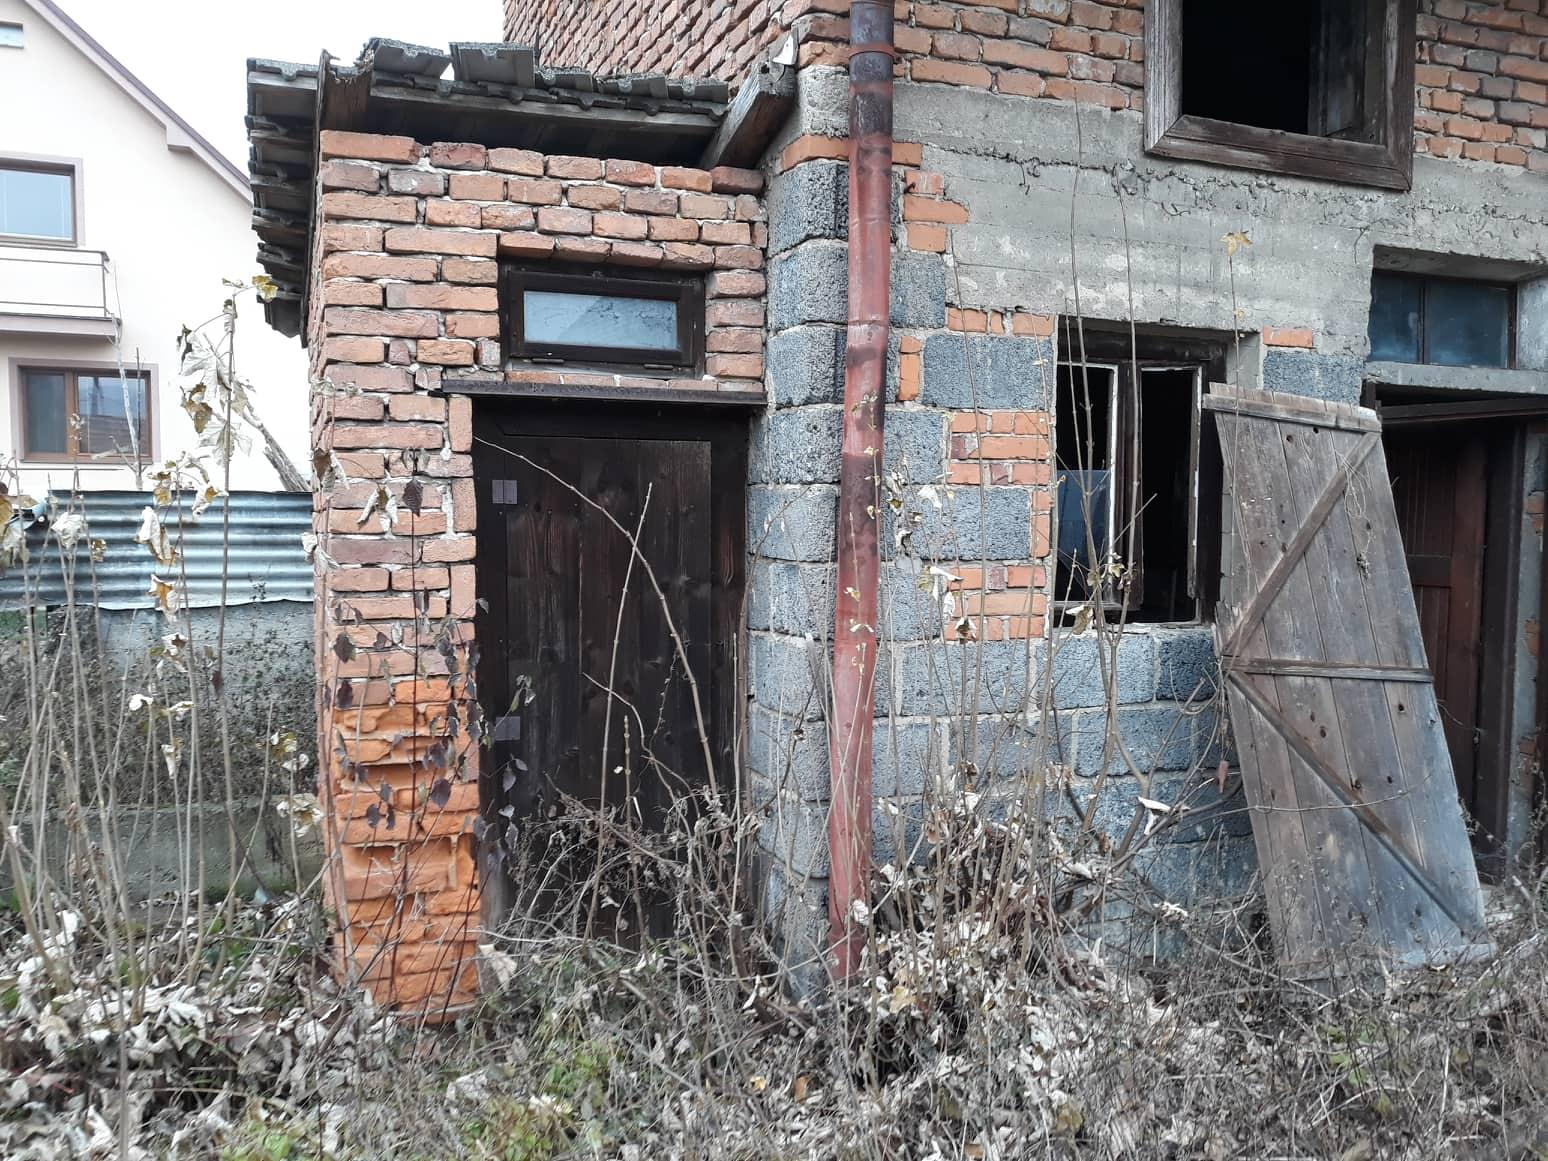 Rekonštrukcia domu-alebo chceme si splniť sen =》🏠🌻🌼🐶  mat domcek a vratit sa na Slovensko - suche WC :-D